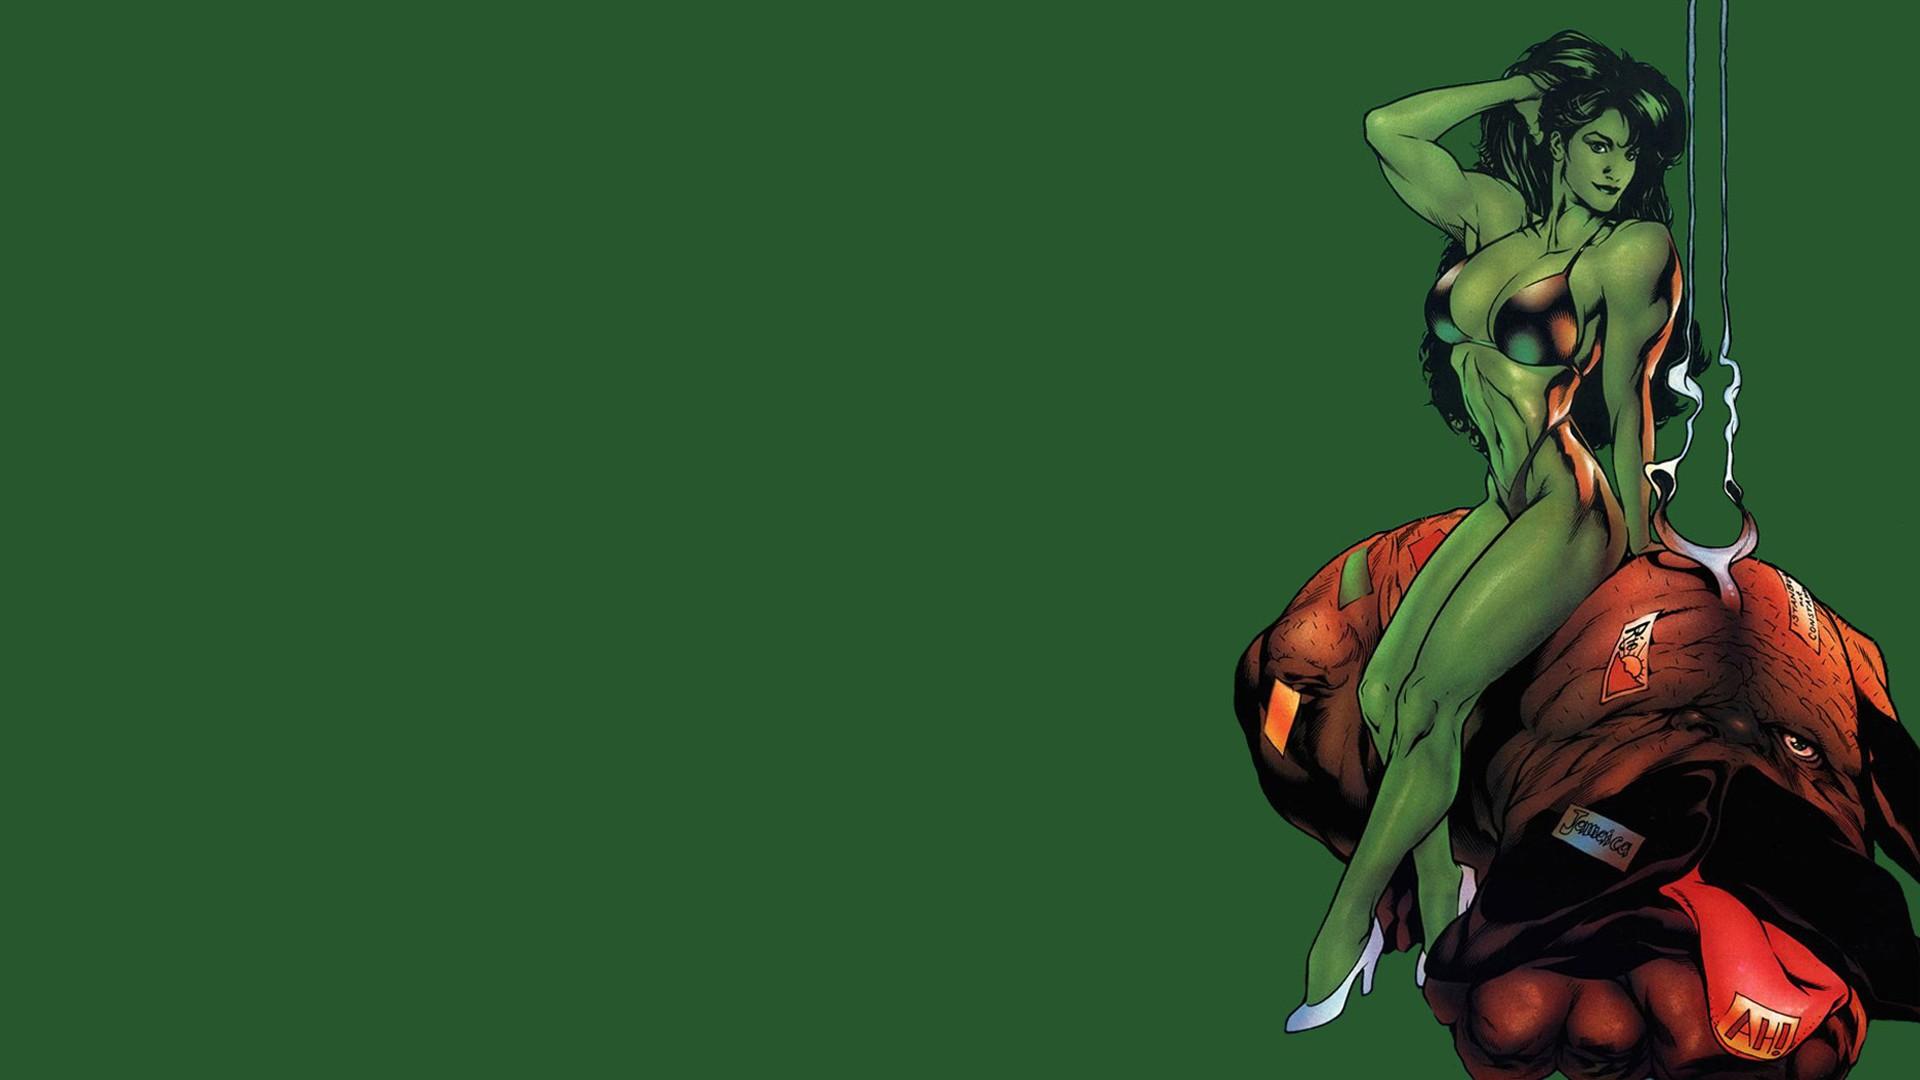 Wallpapers Hd Hulk Fondos De Pantalla Ilustraci 243 N Superh 233 Roe Comics